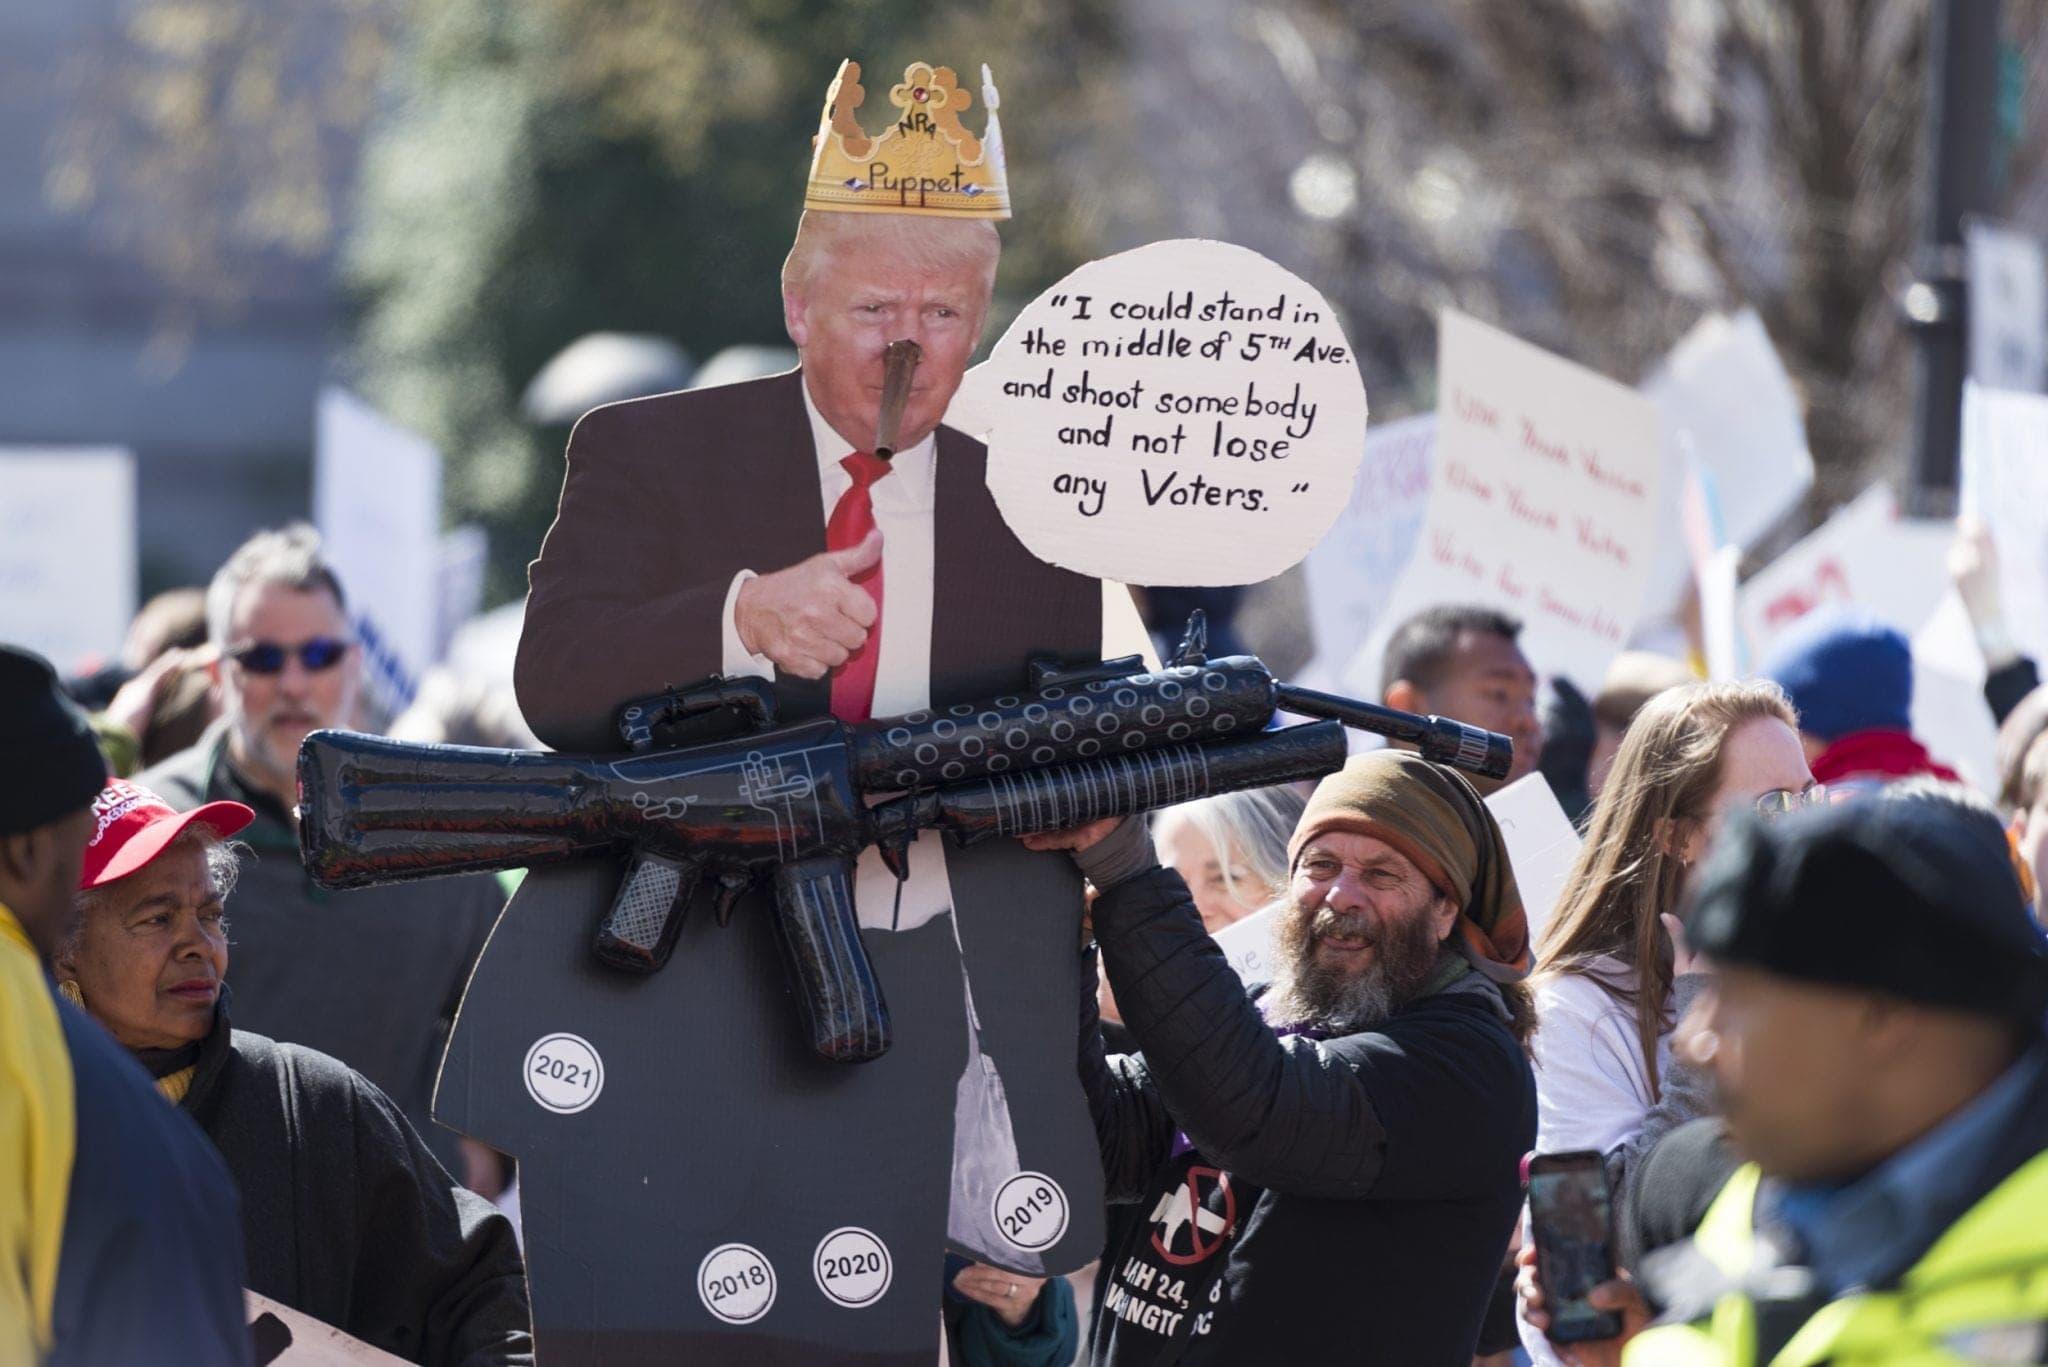 Caricature of President Trump in D.C.